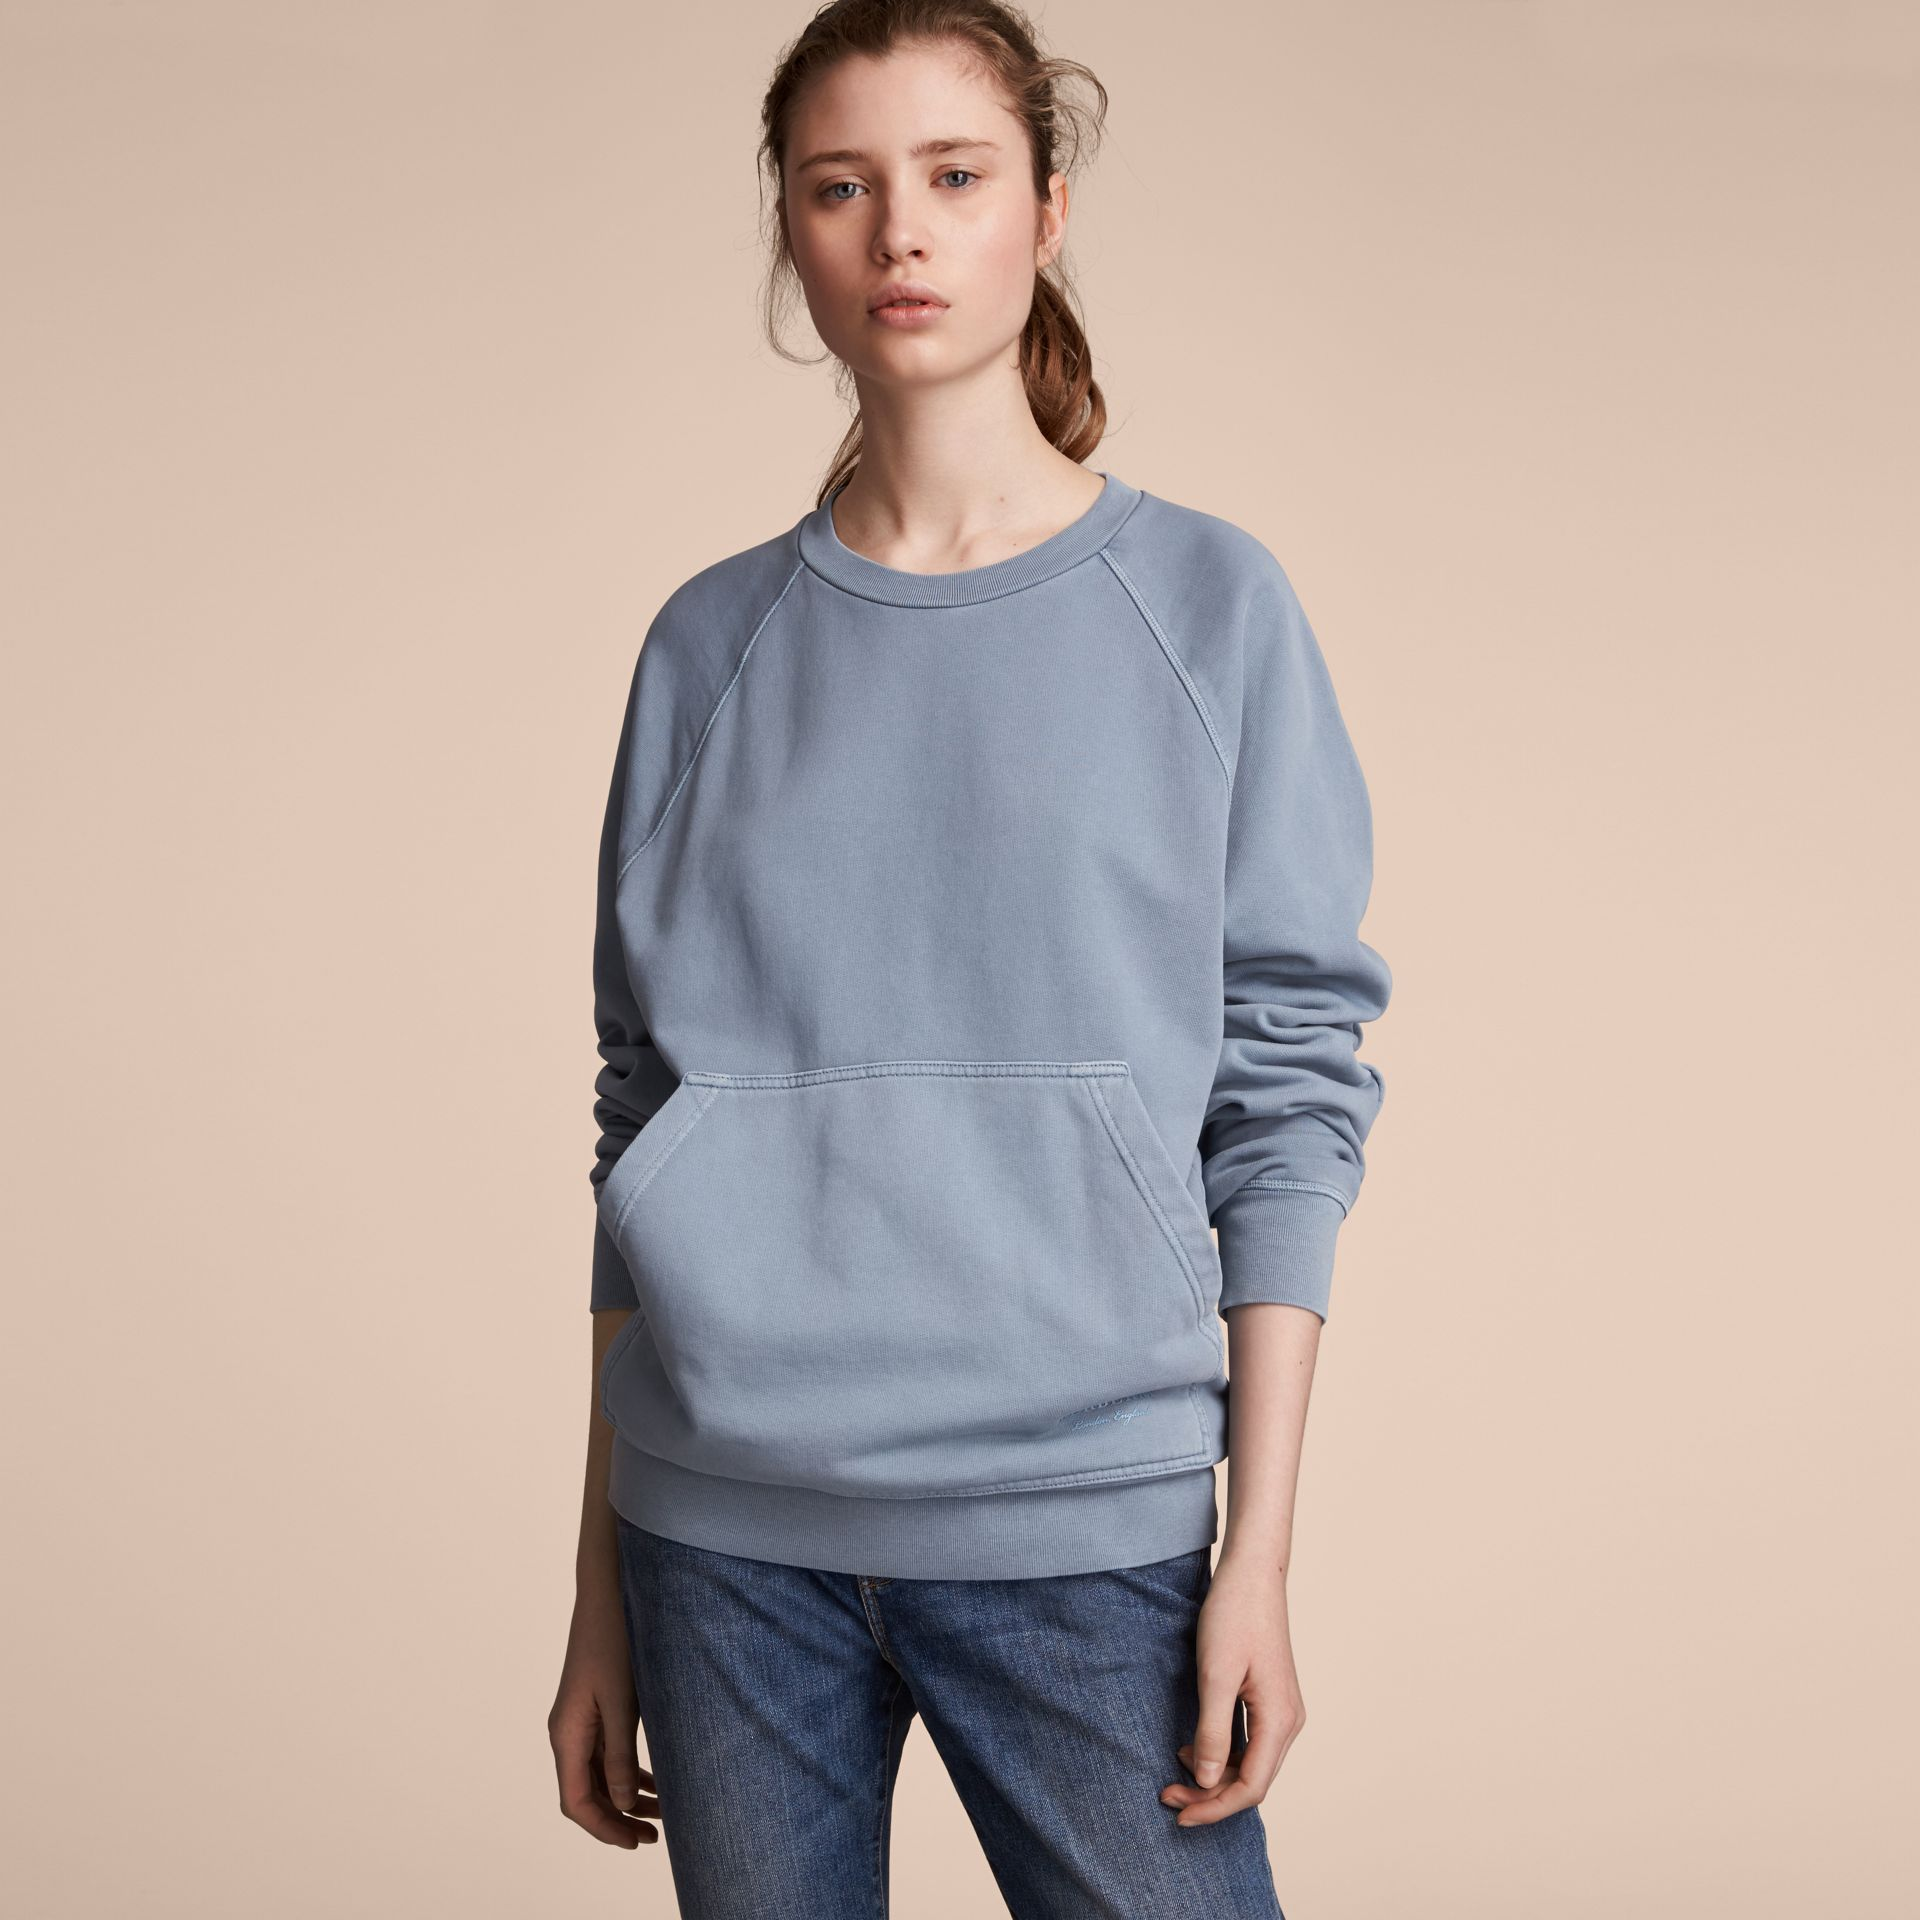 Unisex Pigment-dyed Cotton Oversize Sweatshirt in Dusty Blue - Women | Burberry Singapore - gallery image 6